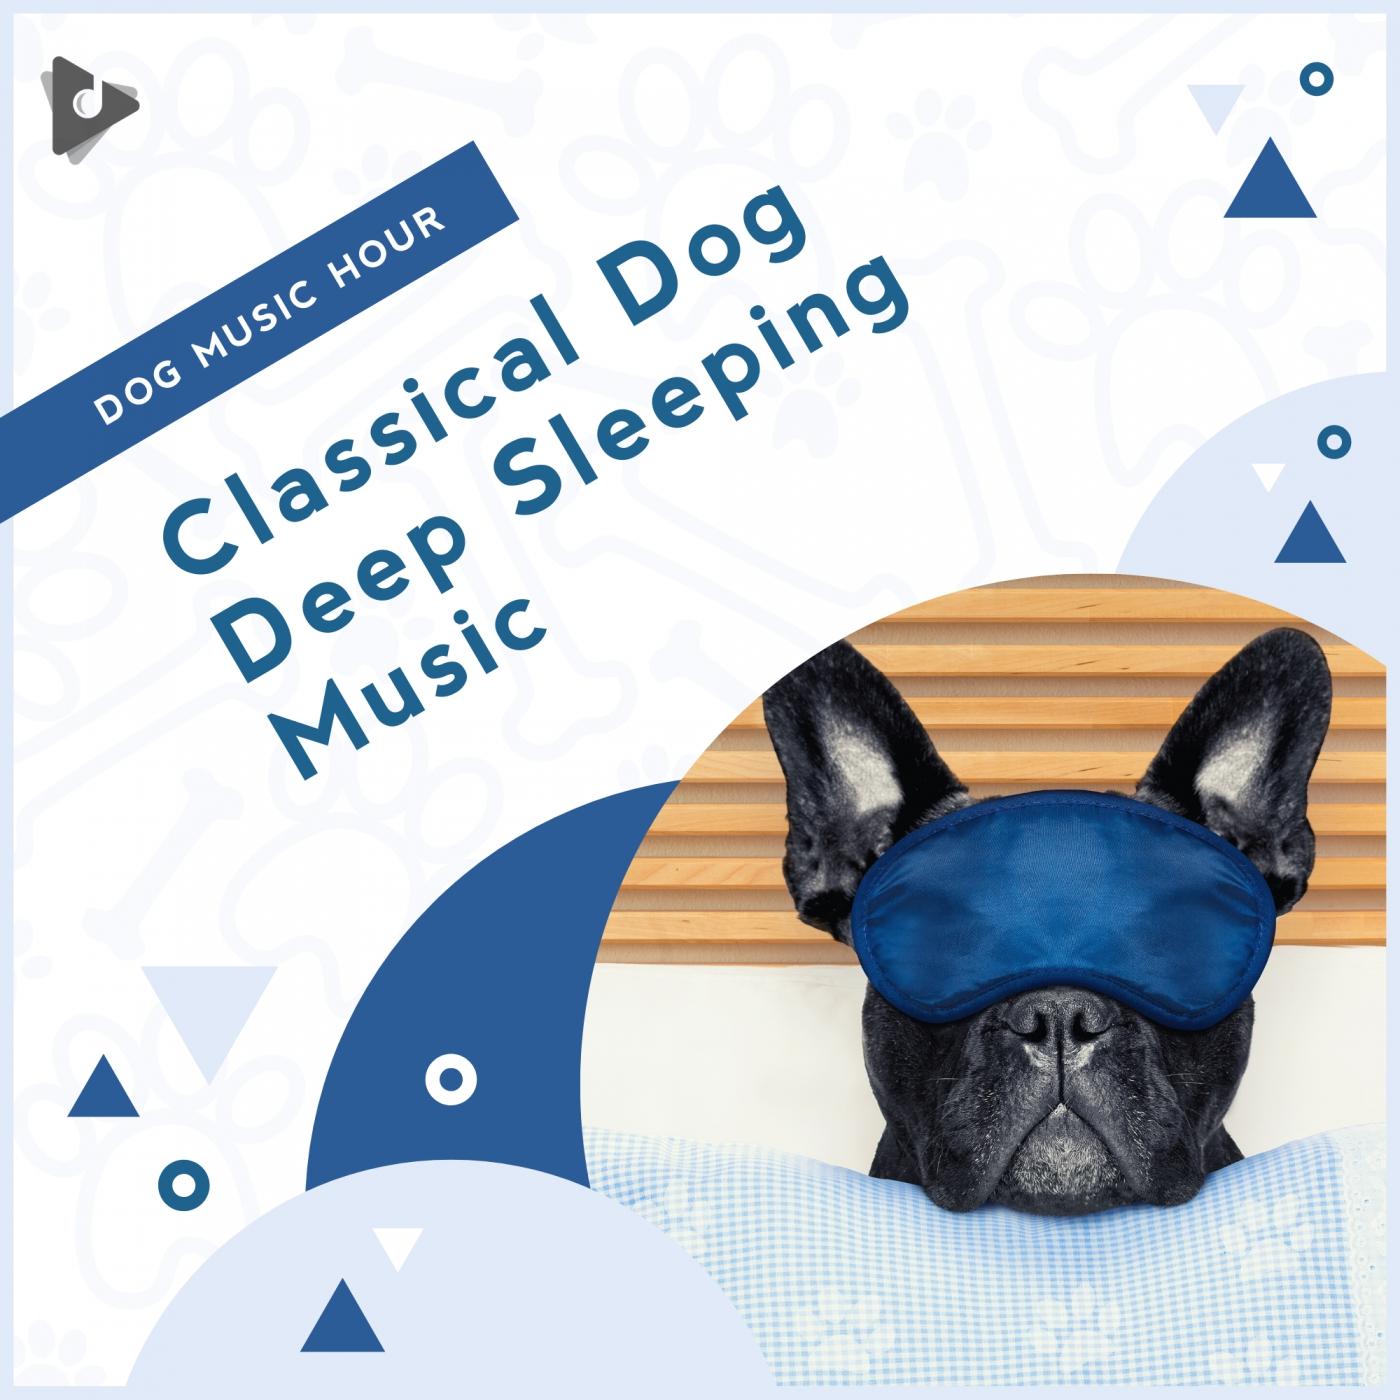 Classical Dog Deep Sleeping Music